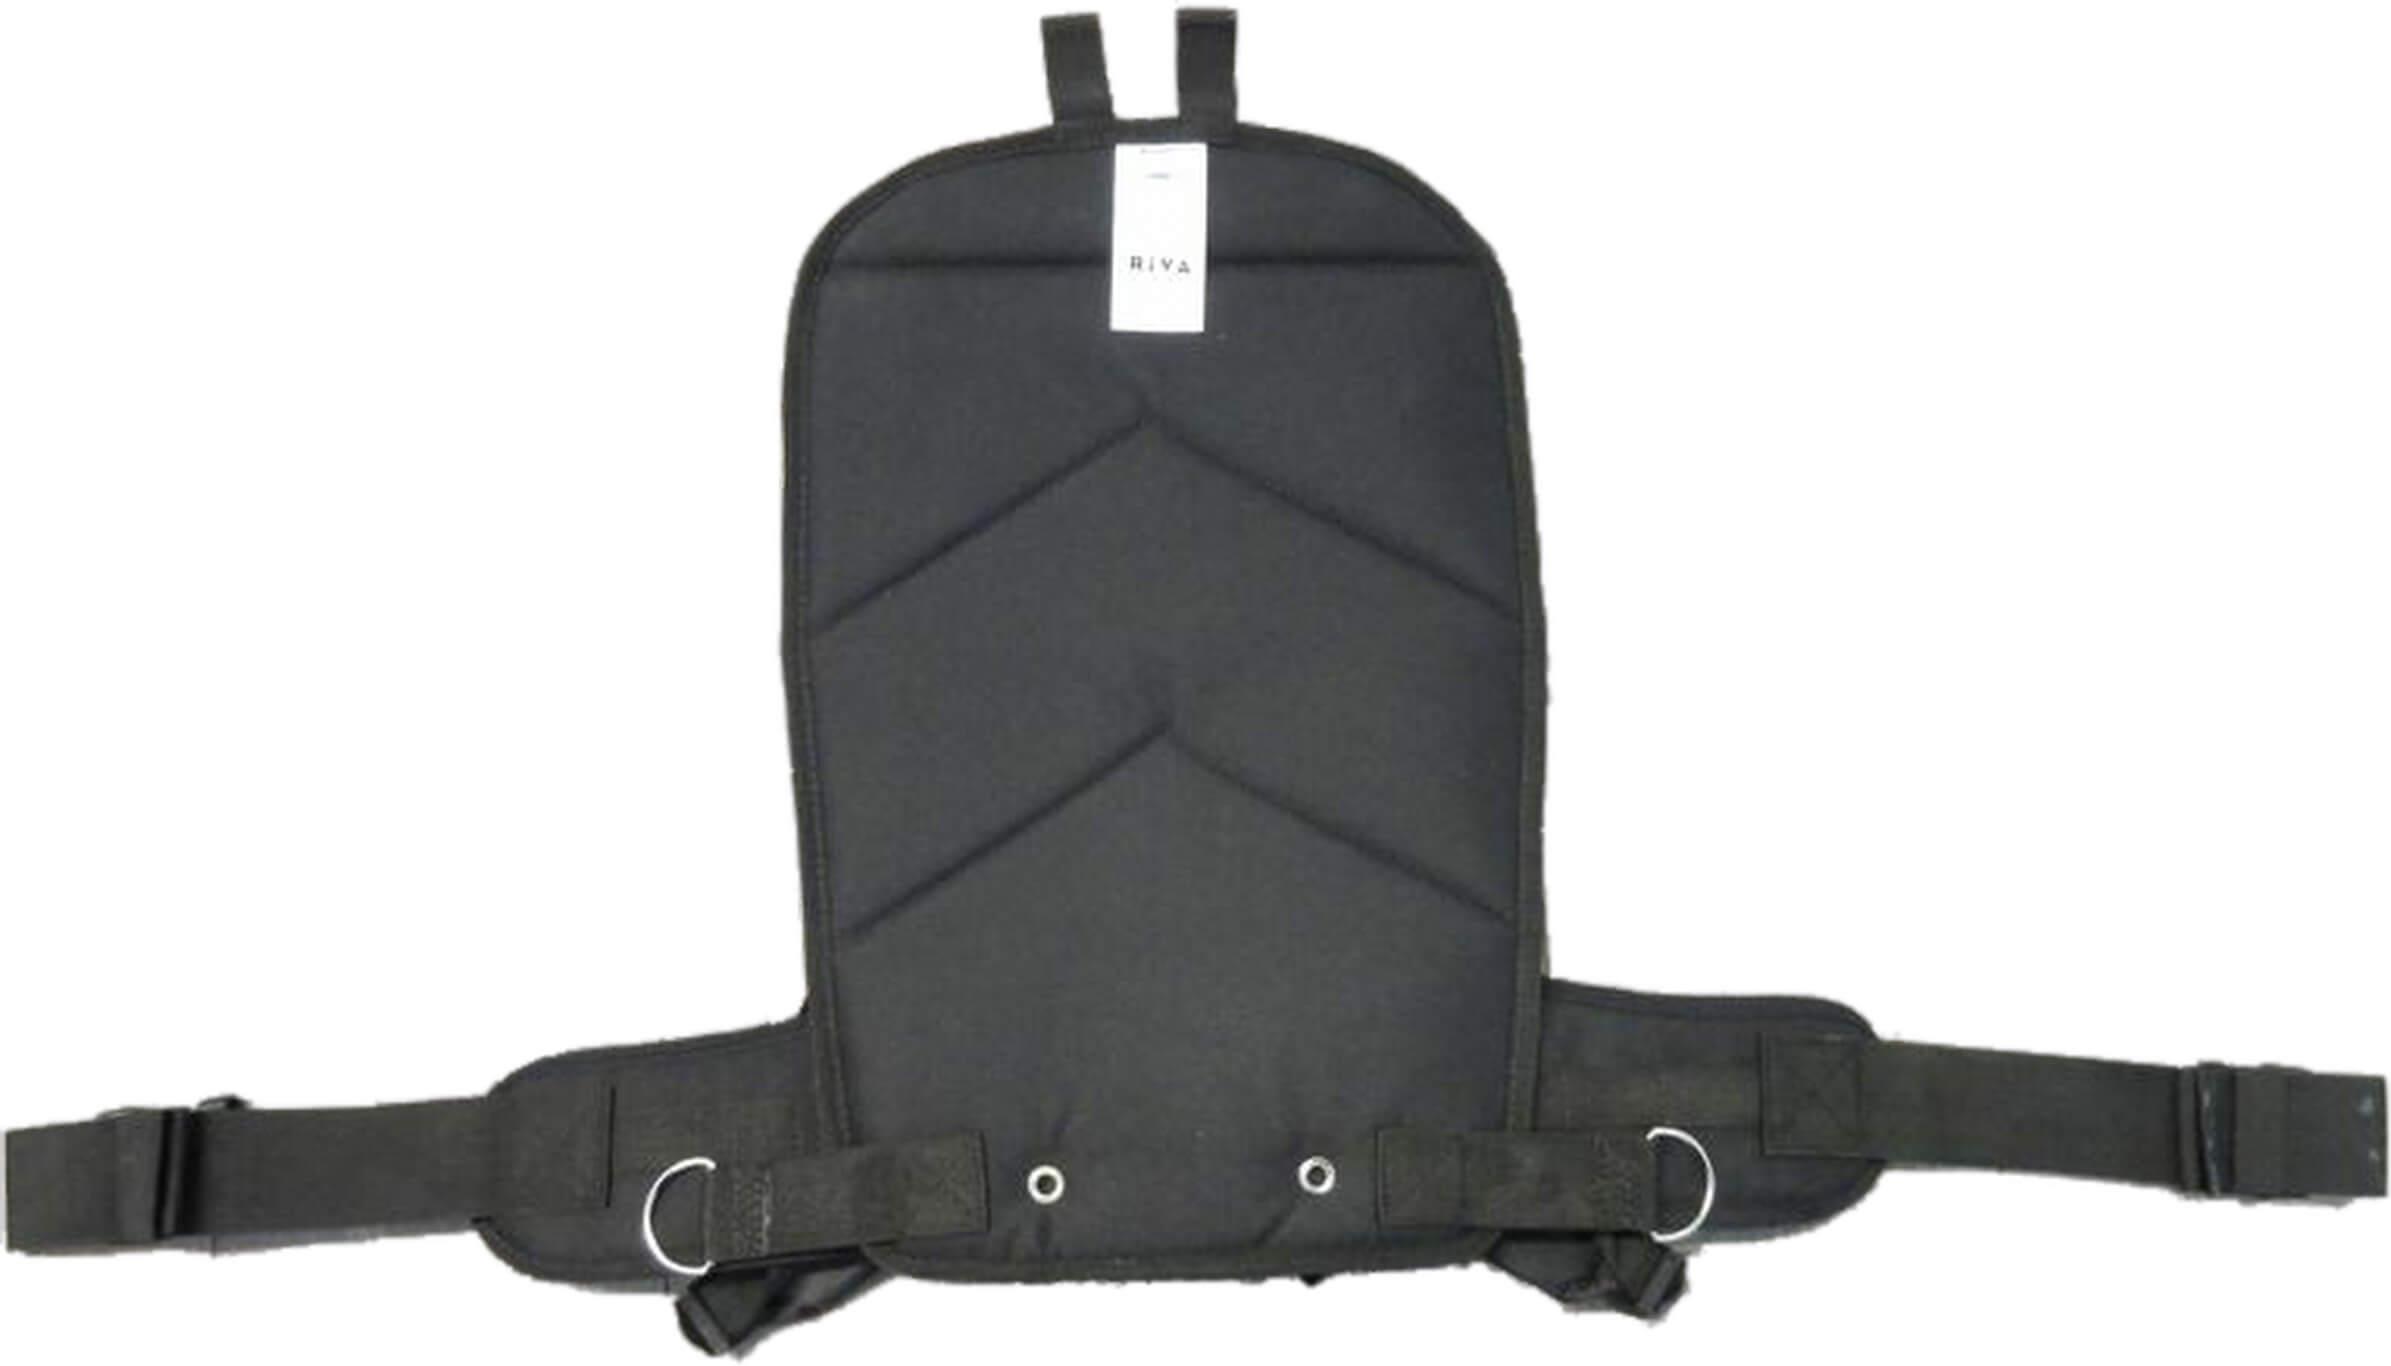 Chem-Lock® Comfort Harness (Mesto RS185/Stihl SG 71 Model)